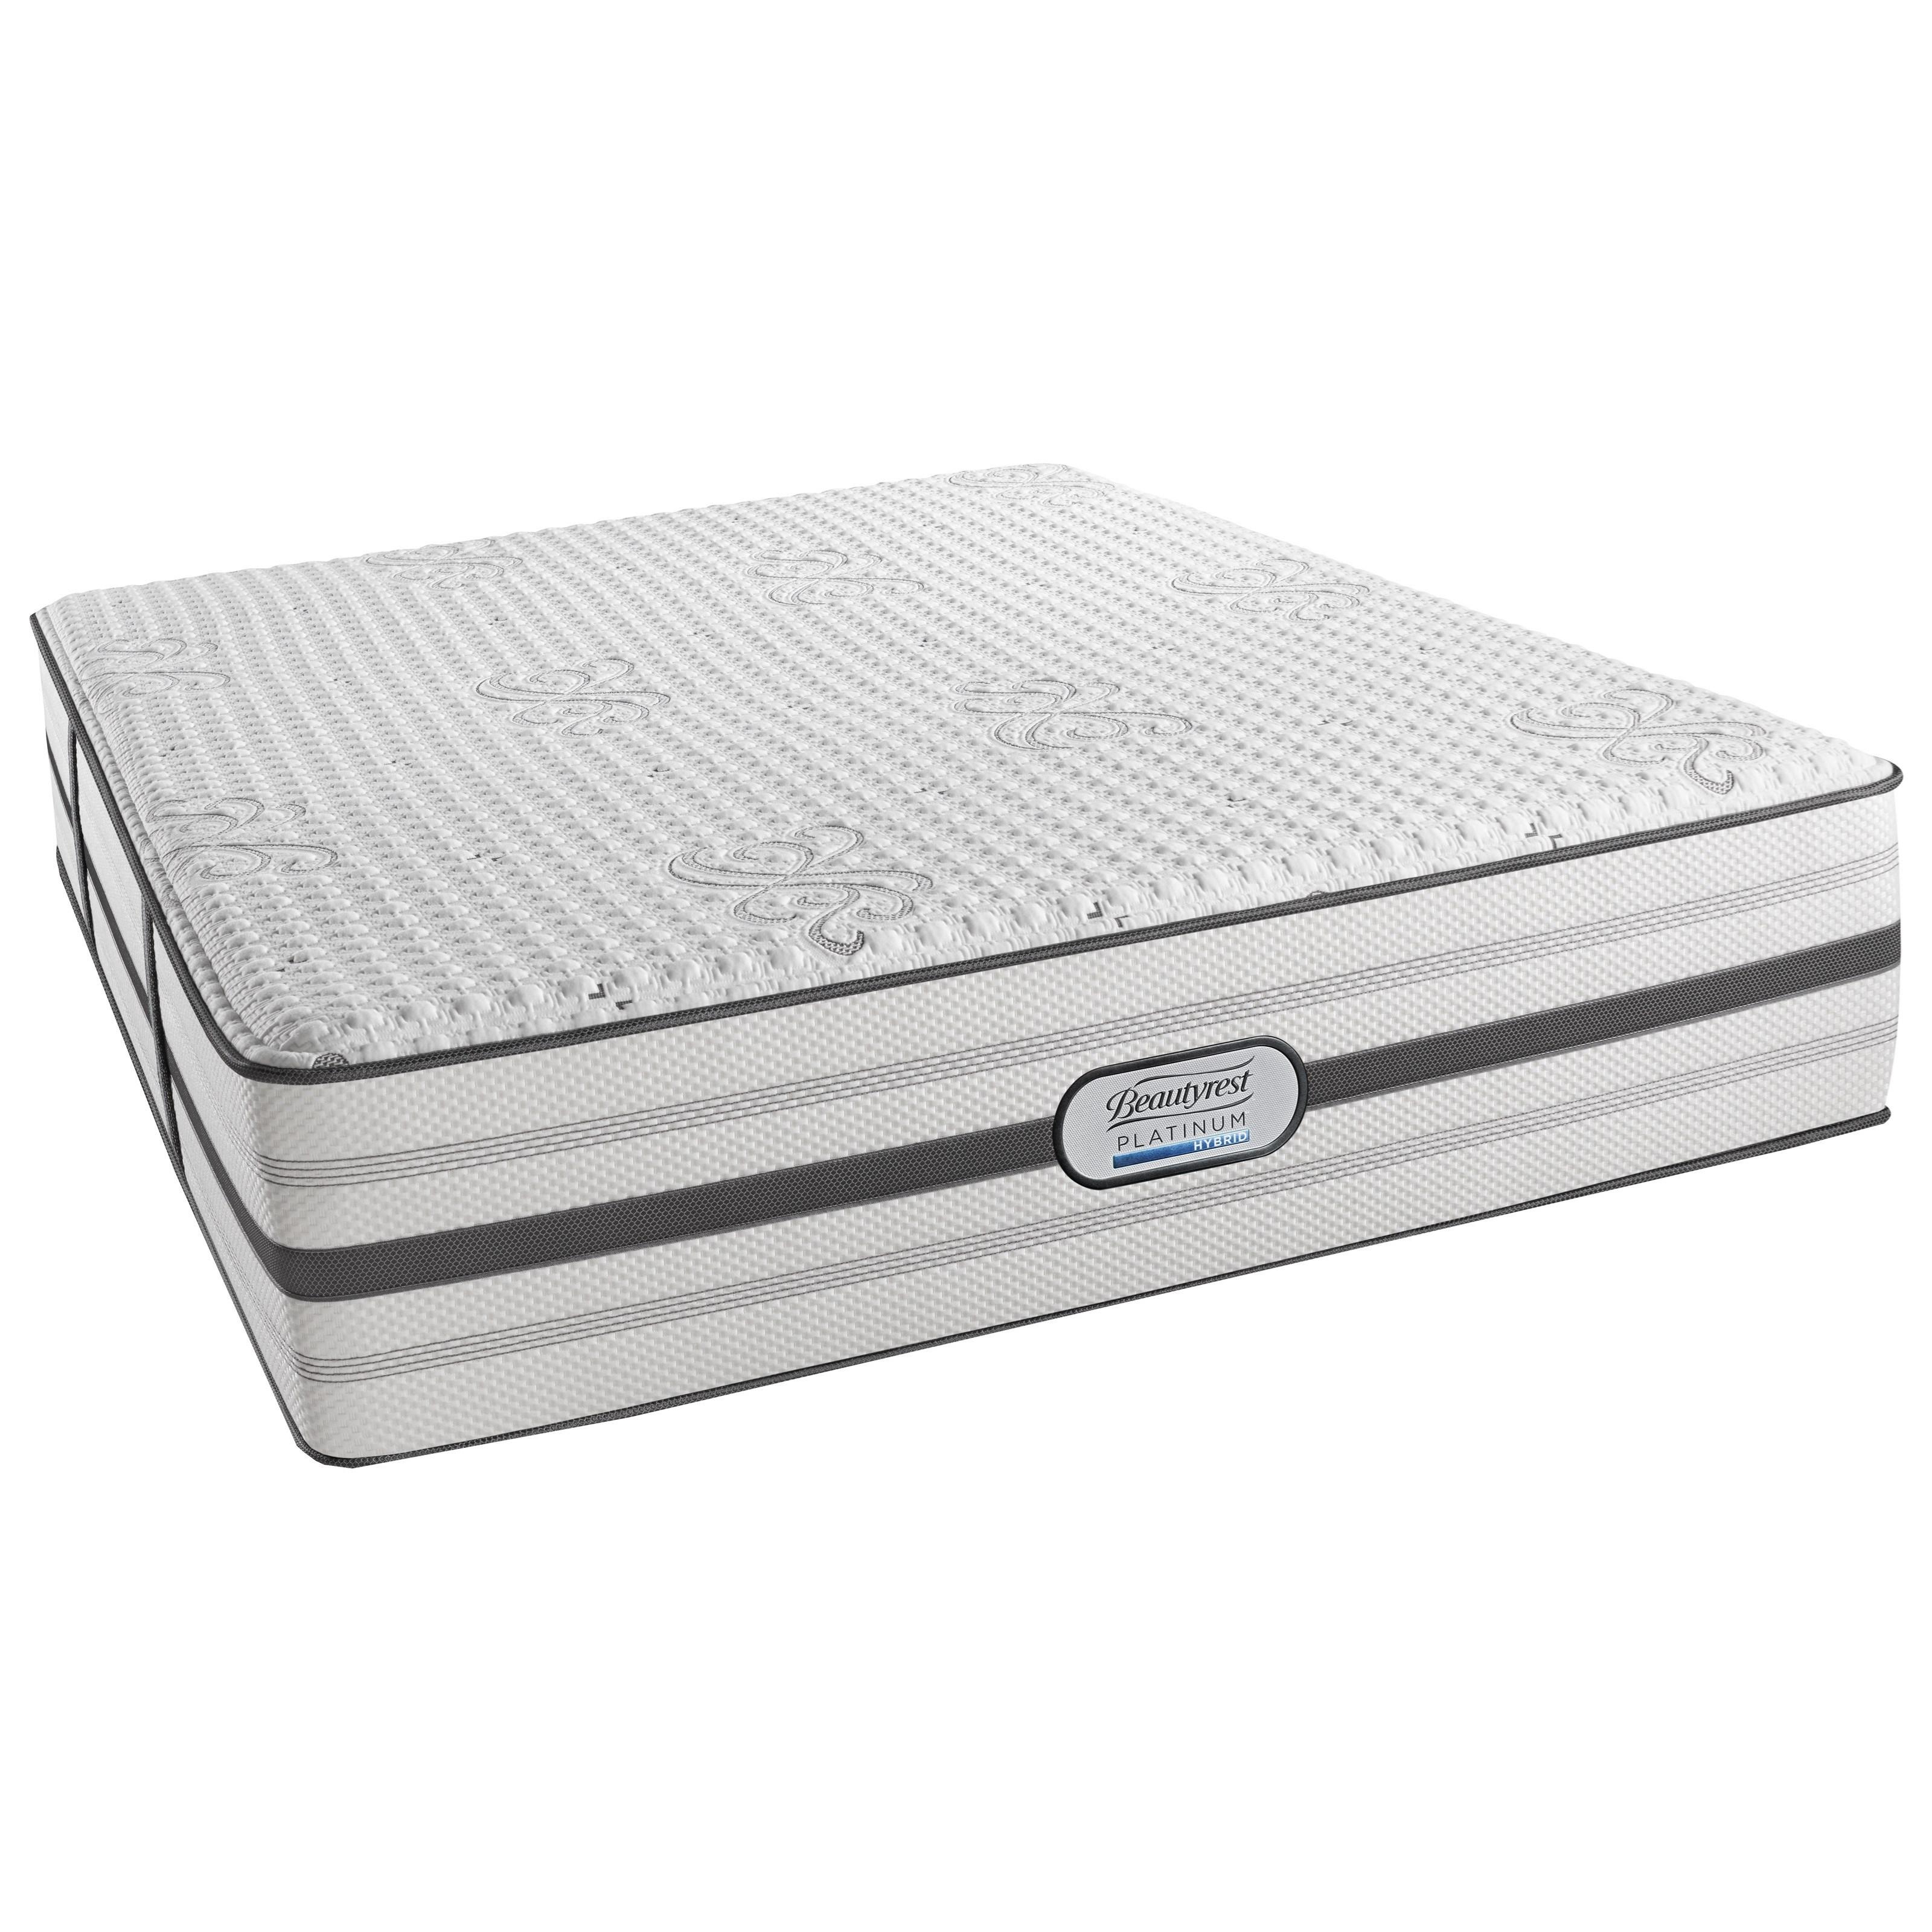 Beautyrest Platinum Austin Cal King Luxury Firm Adjustable Set - Item Number: BRHLV1LF-CK+2xSM2-SPCK